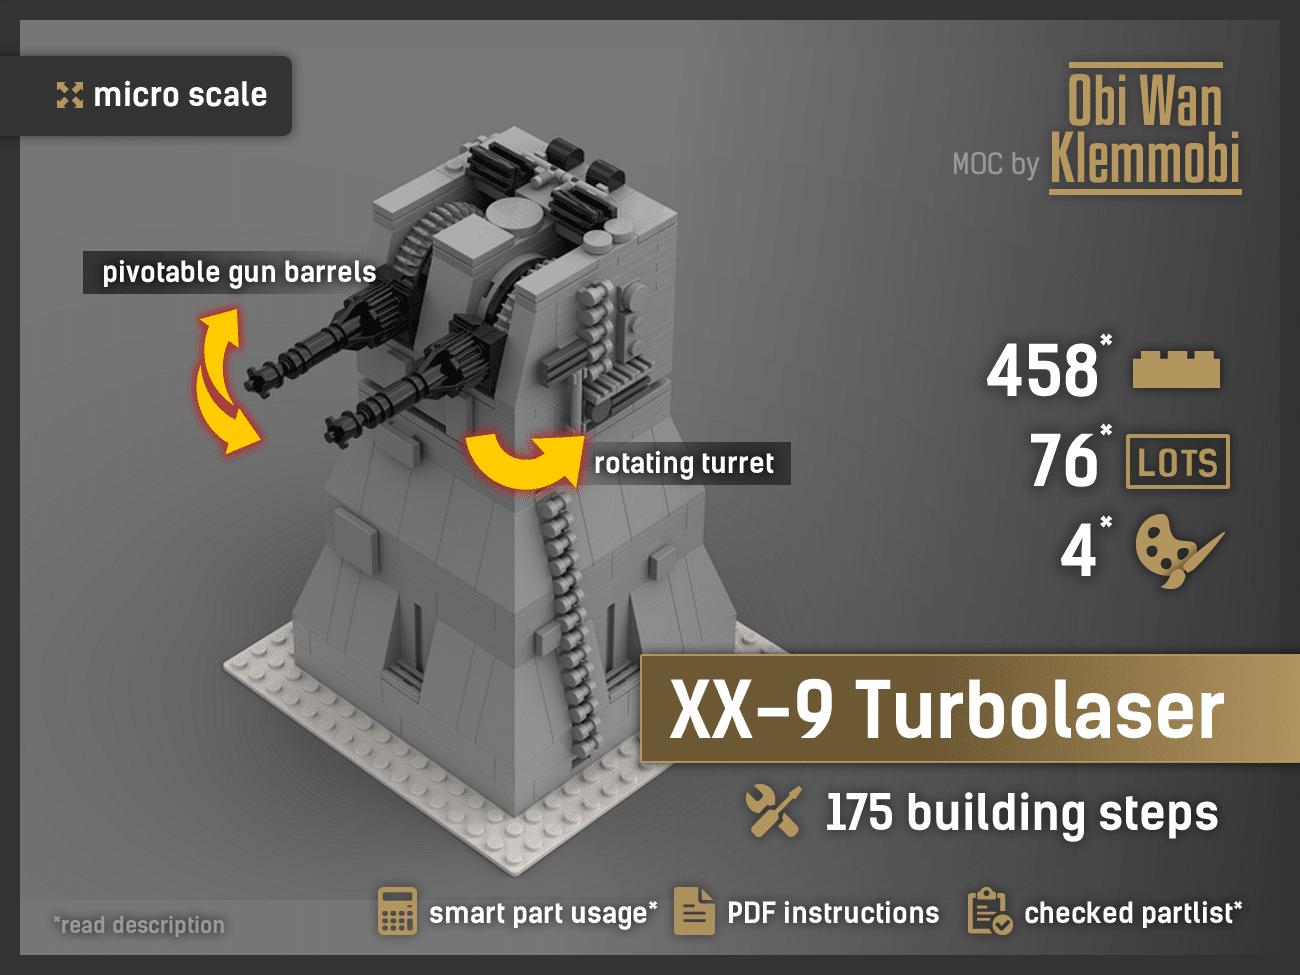 XX-9 Turbolaser